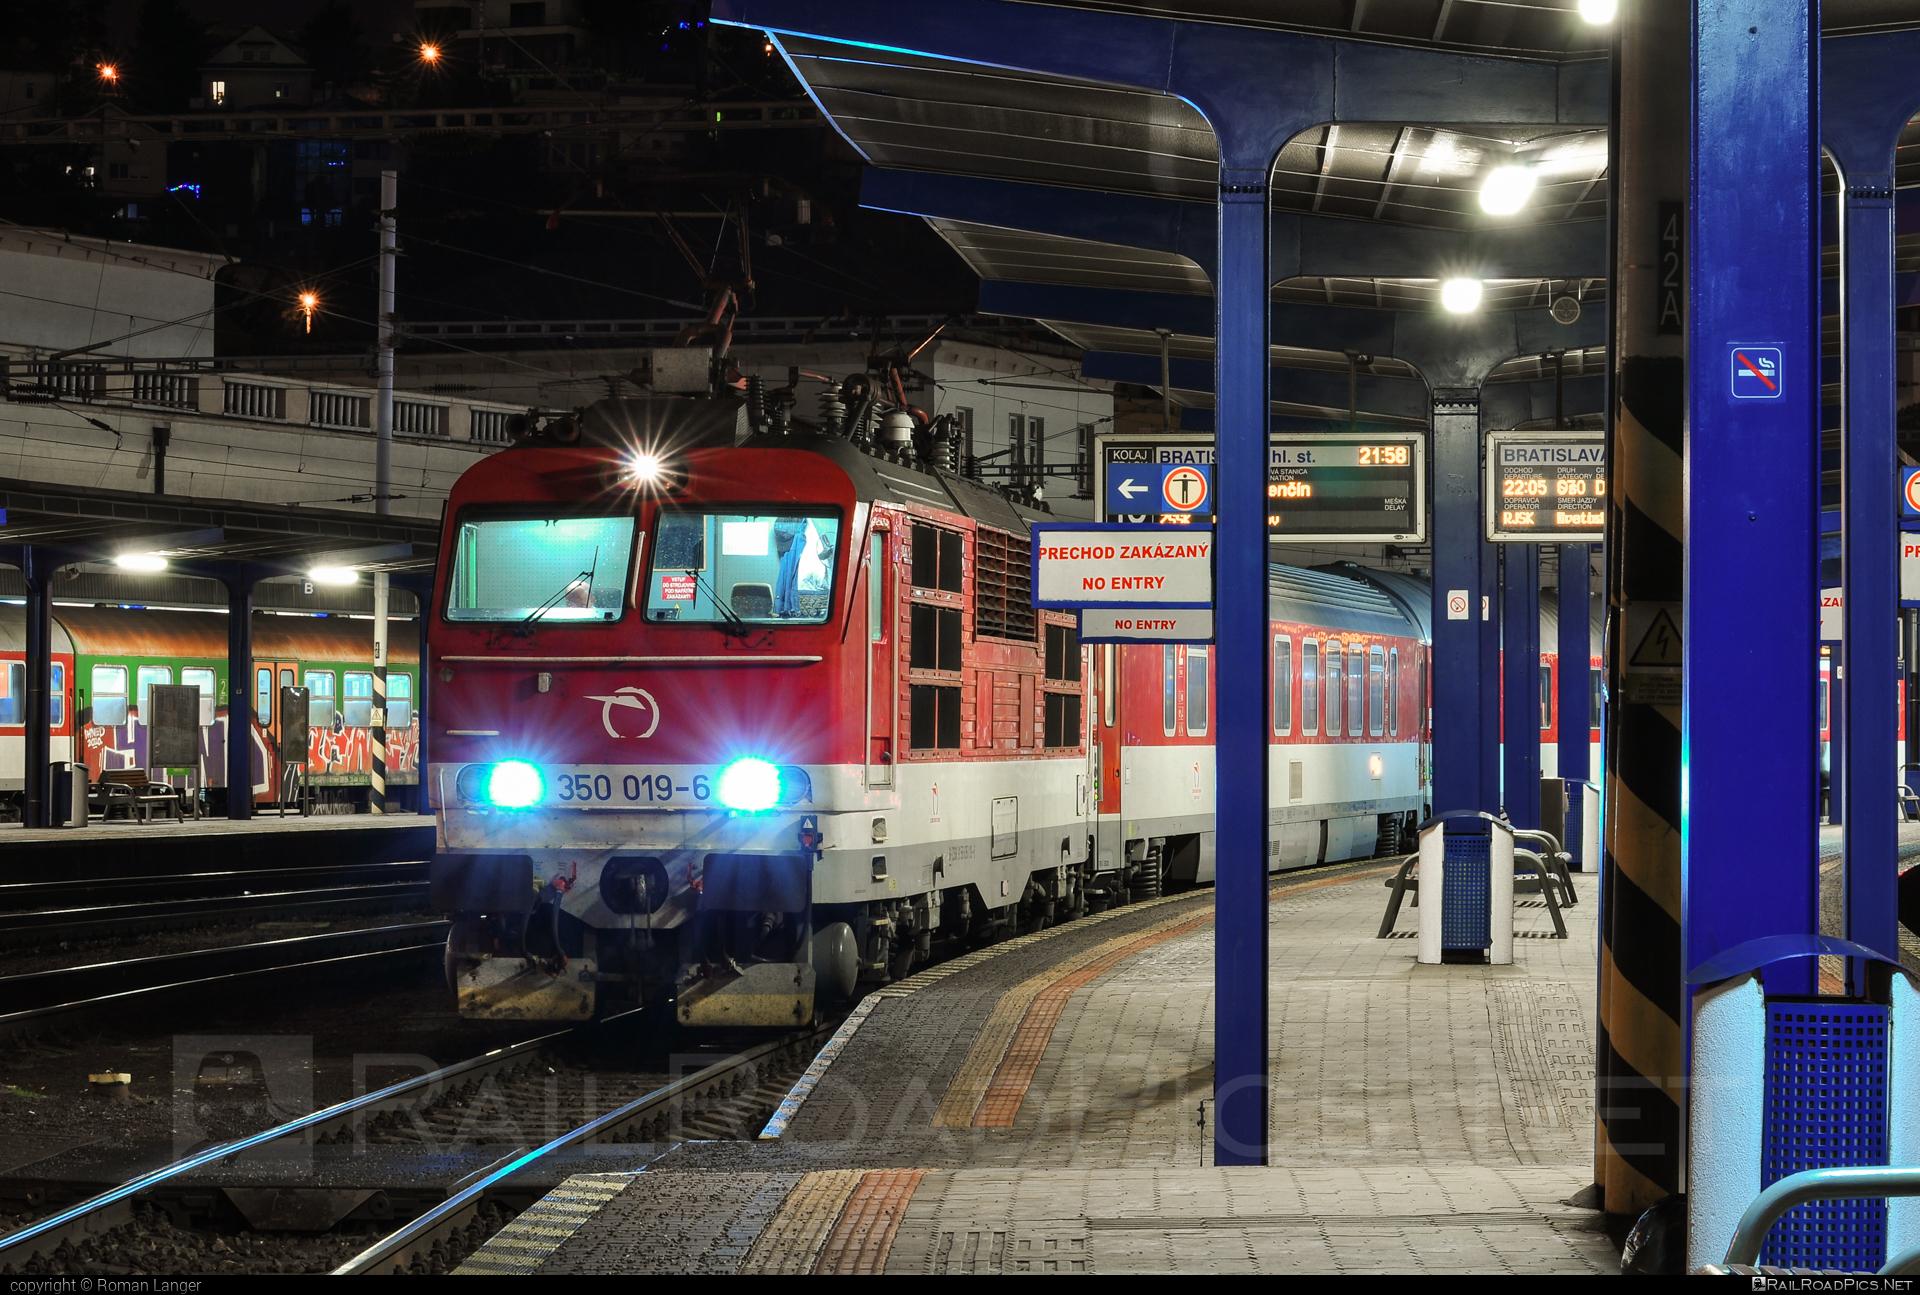 Škoda 55E - 350 019-6 operated by Železničná Spoločnost' Slovensko, a.s. #ZeleznicnaSpolocnostSlovensko #gorila #locomotive350 #skoda #skoda55e #zssk